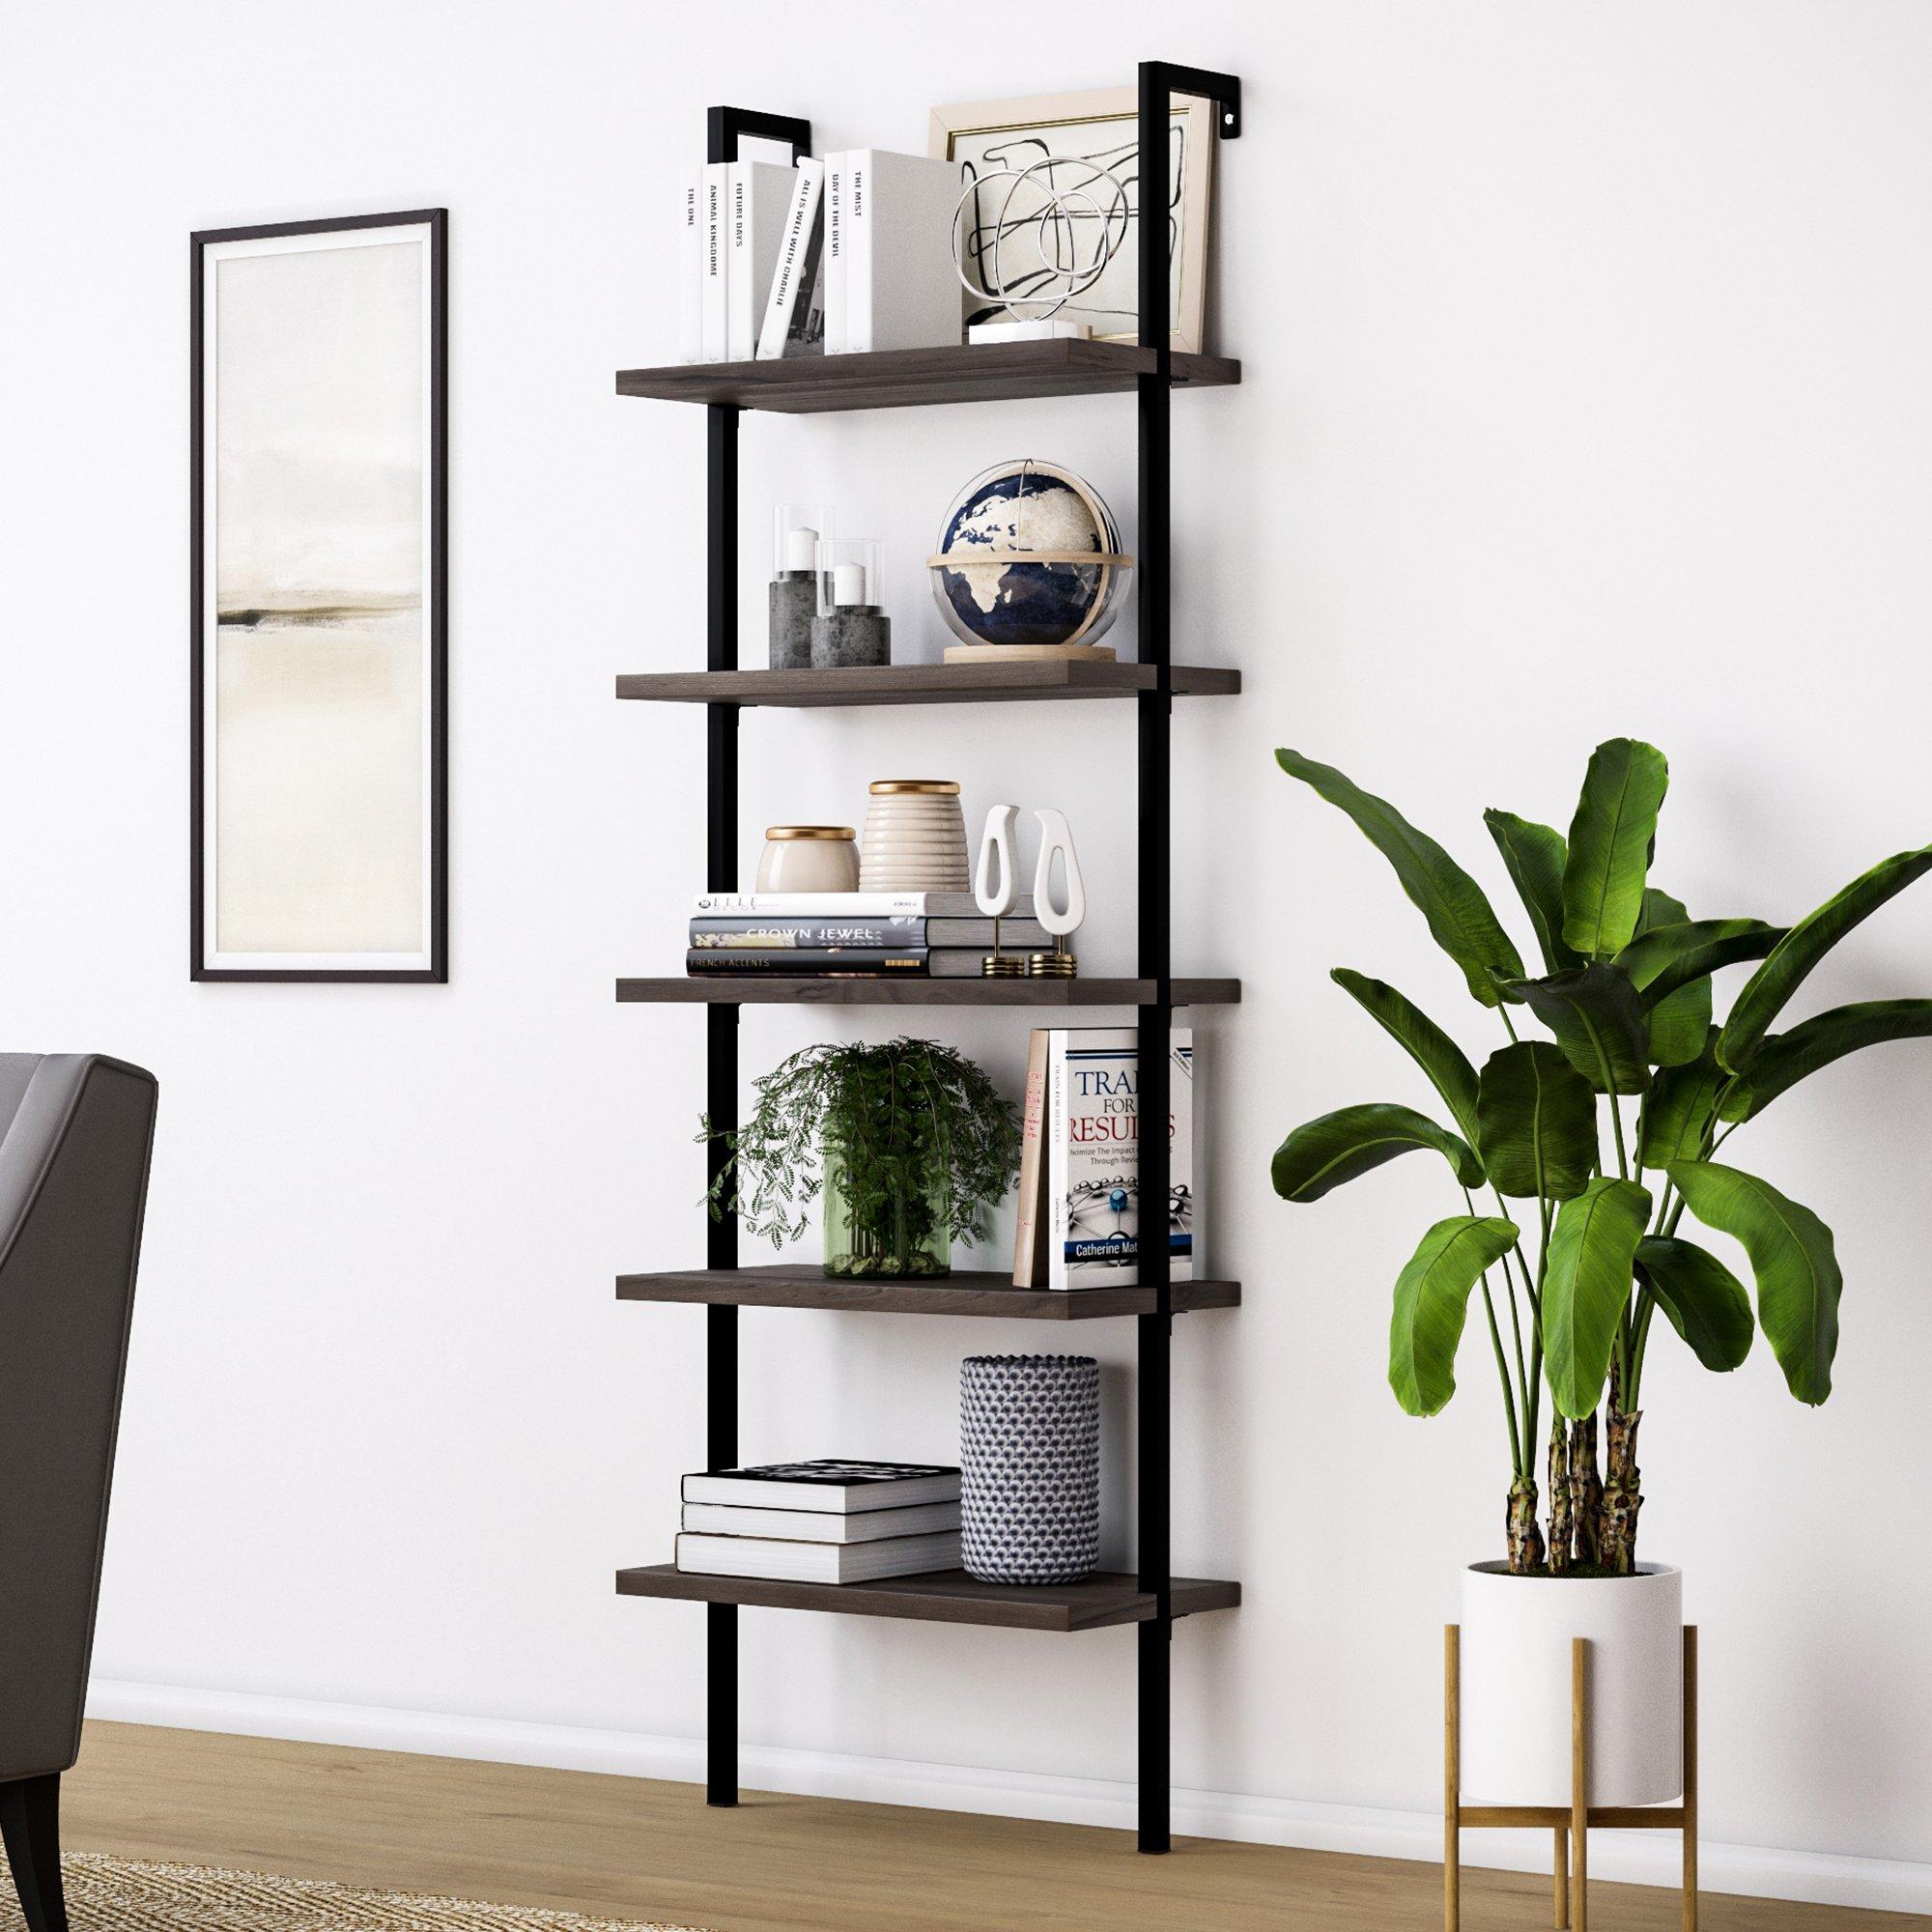 Nathan James 65501 Theo 5-Shelf Wood Ladder Bookcase with Metal Frame, Dark Walnut Brown/Black by Nathan James